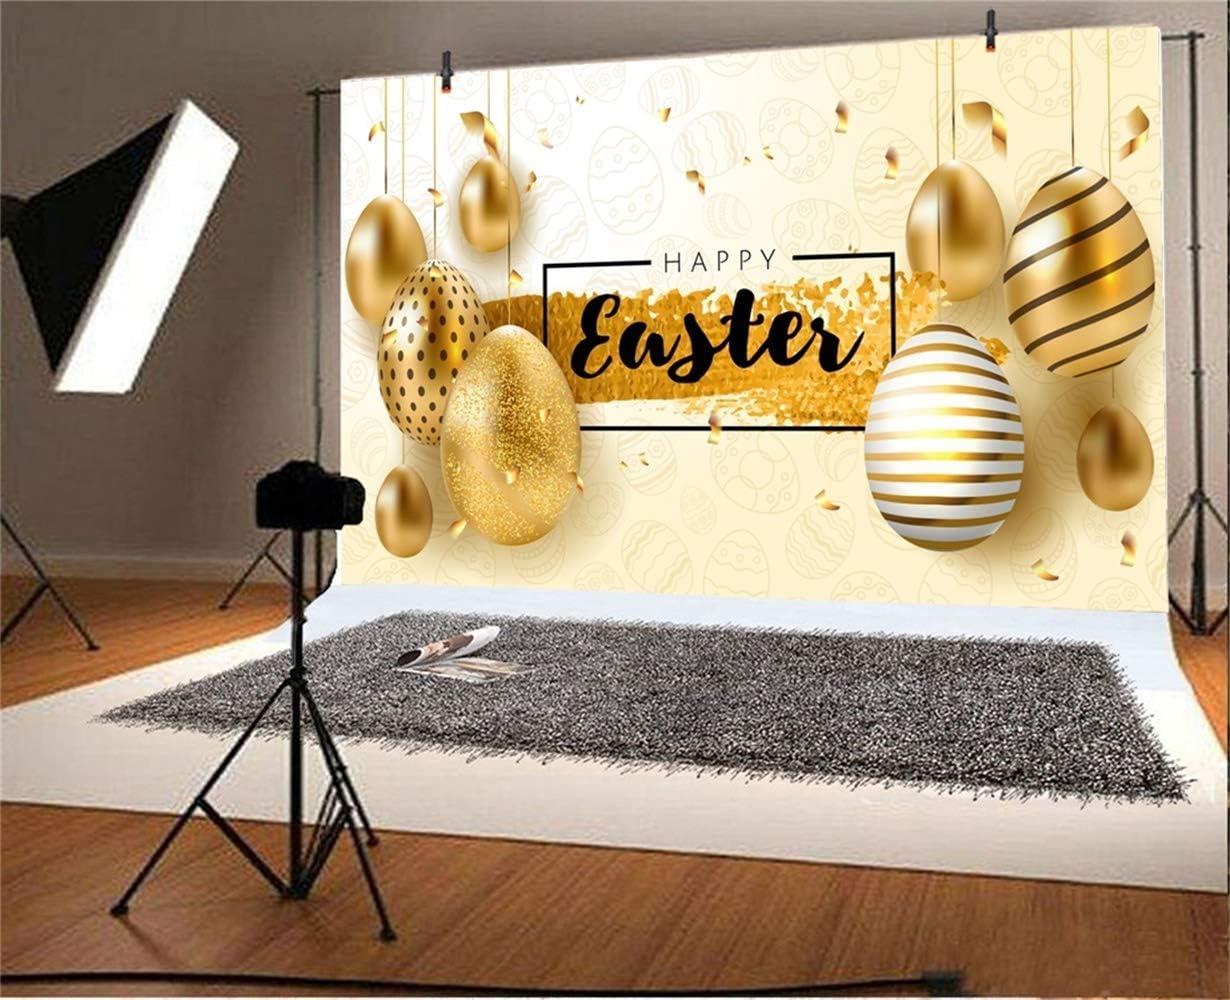 CdHBH 10x8ft Vinyl Happy Easter Photography Background Hanging Golden Easter Eggs Confetti Ornaments Eggs Illustration Backdrop Child Kids Baby Portrait Greeting Card Easter Egg Hunt Wallpaper